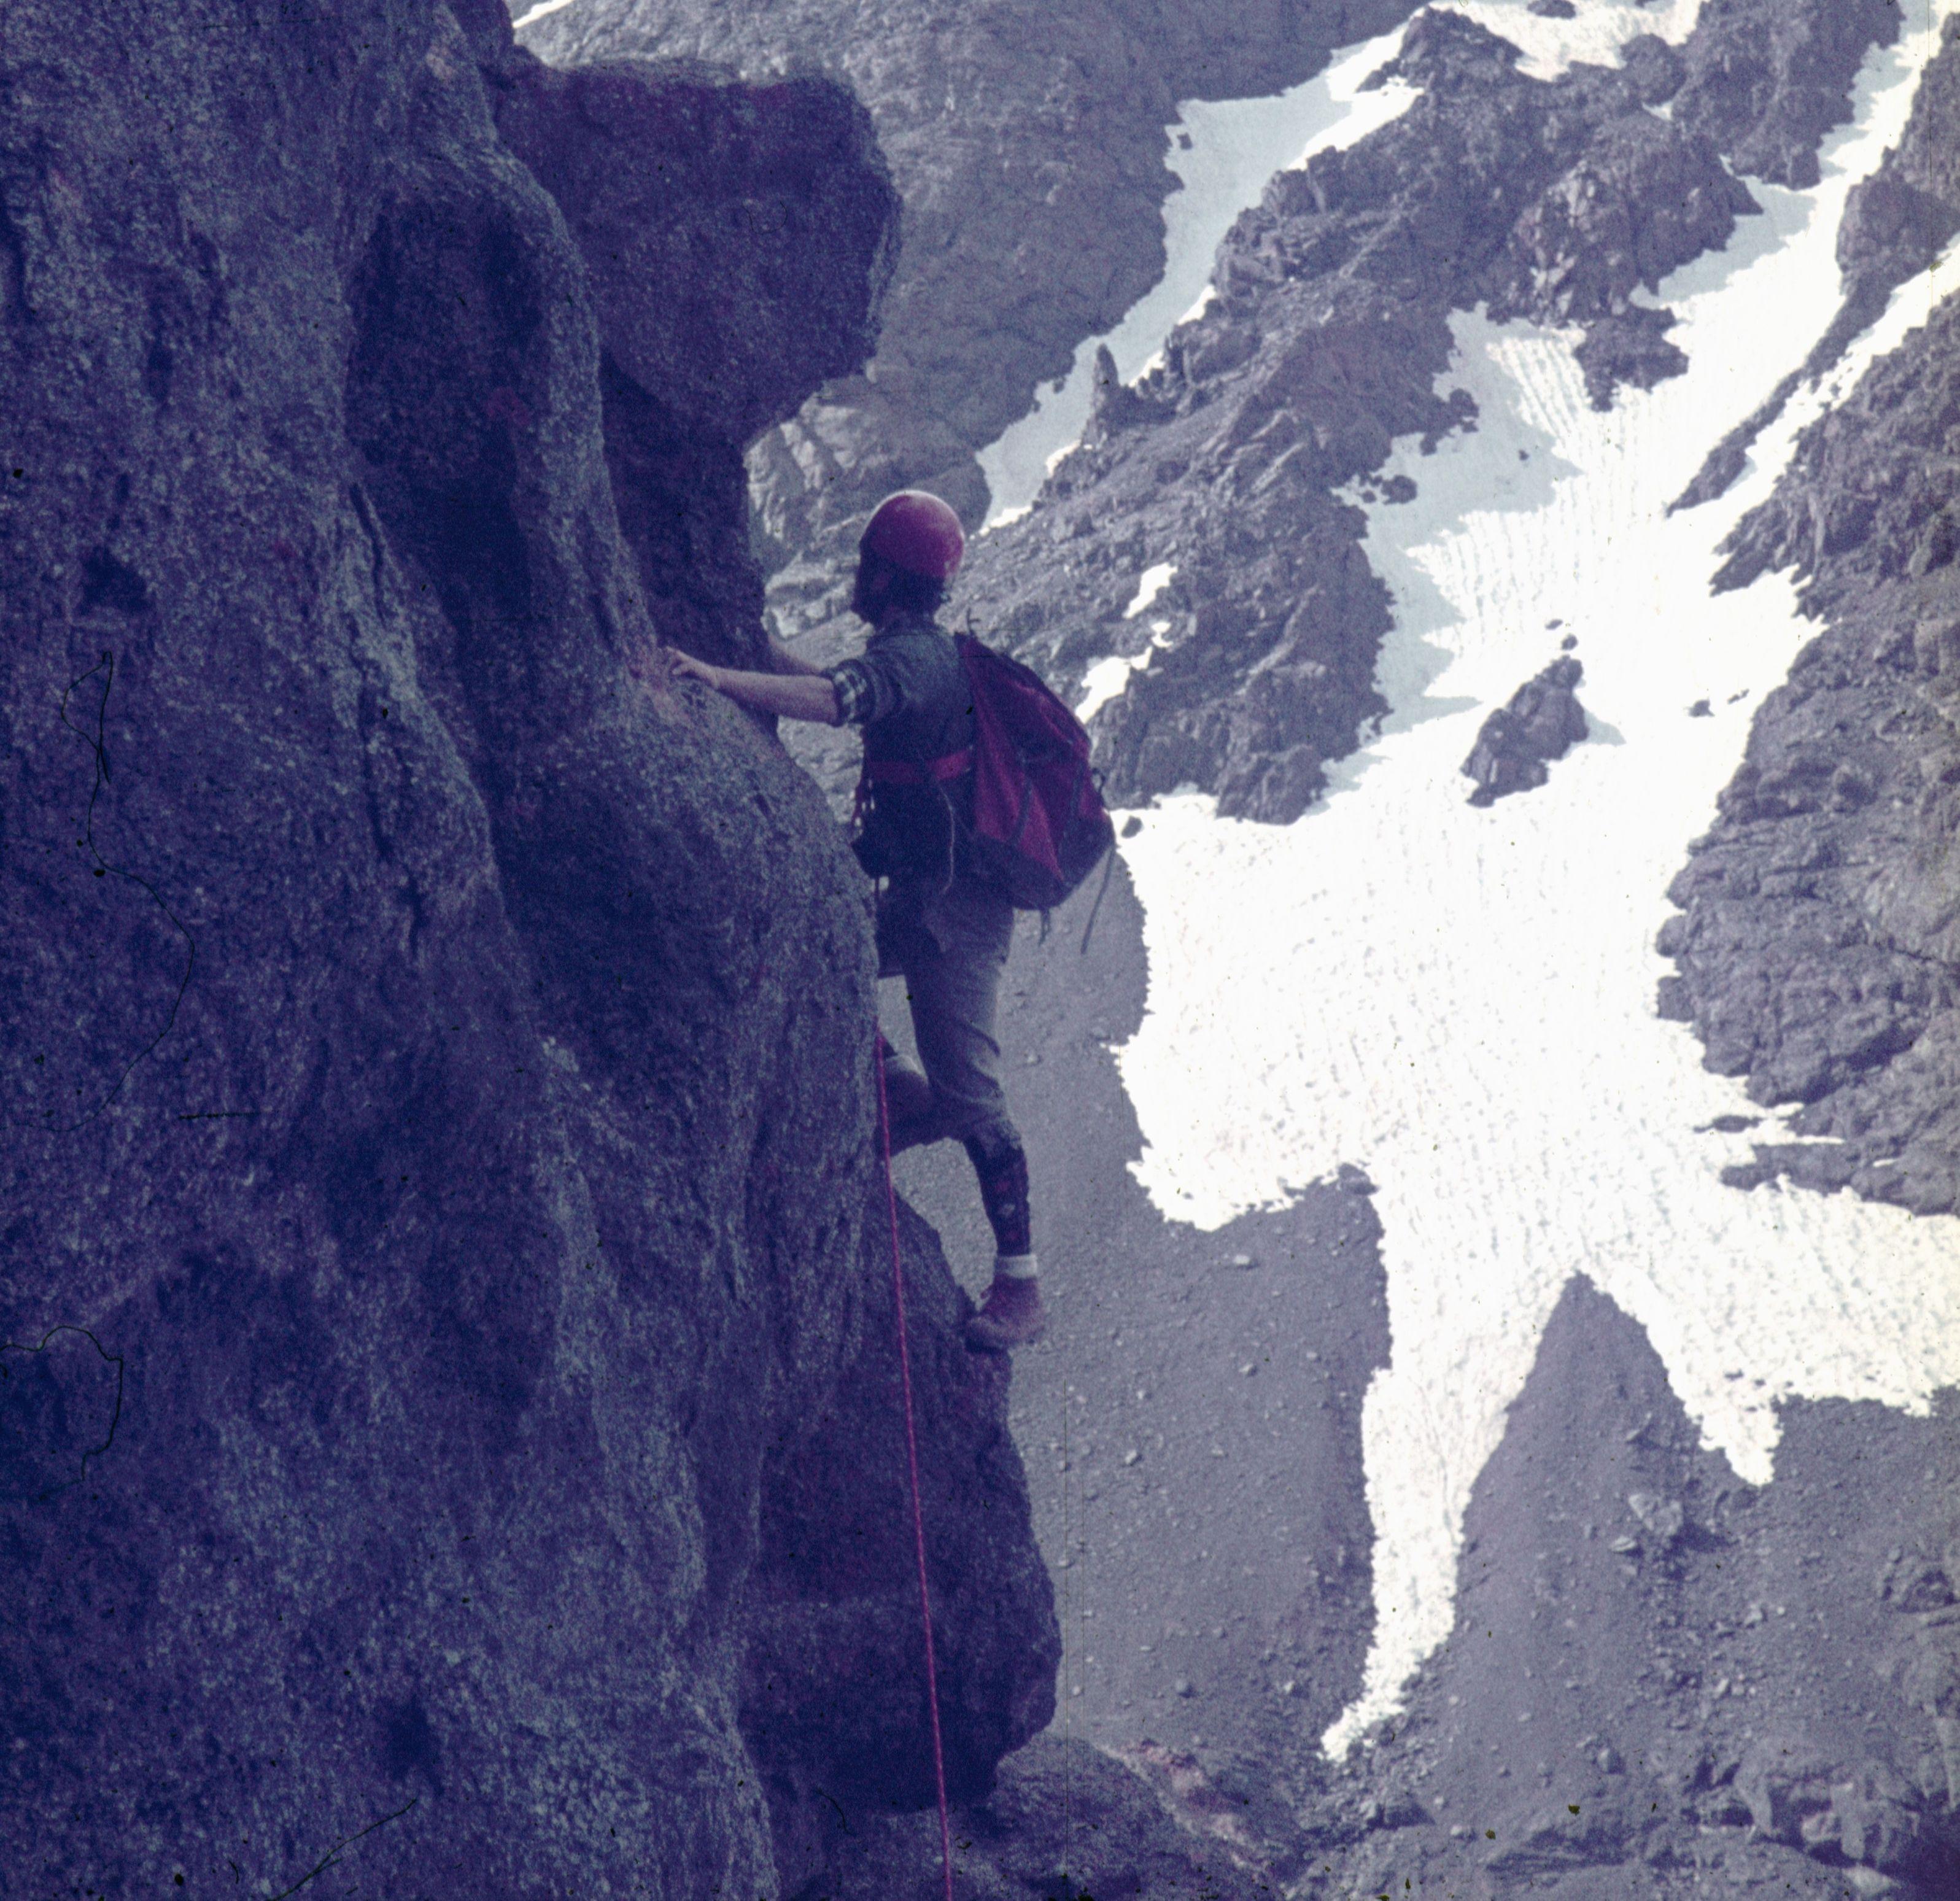 aresta nord - oest al toubkal 4.165 m